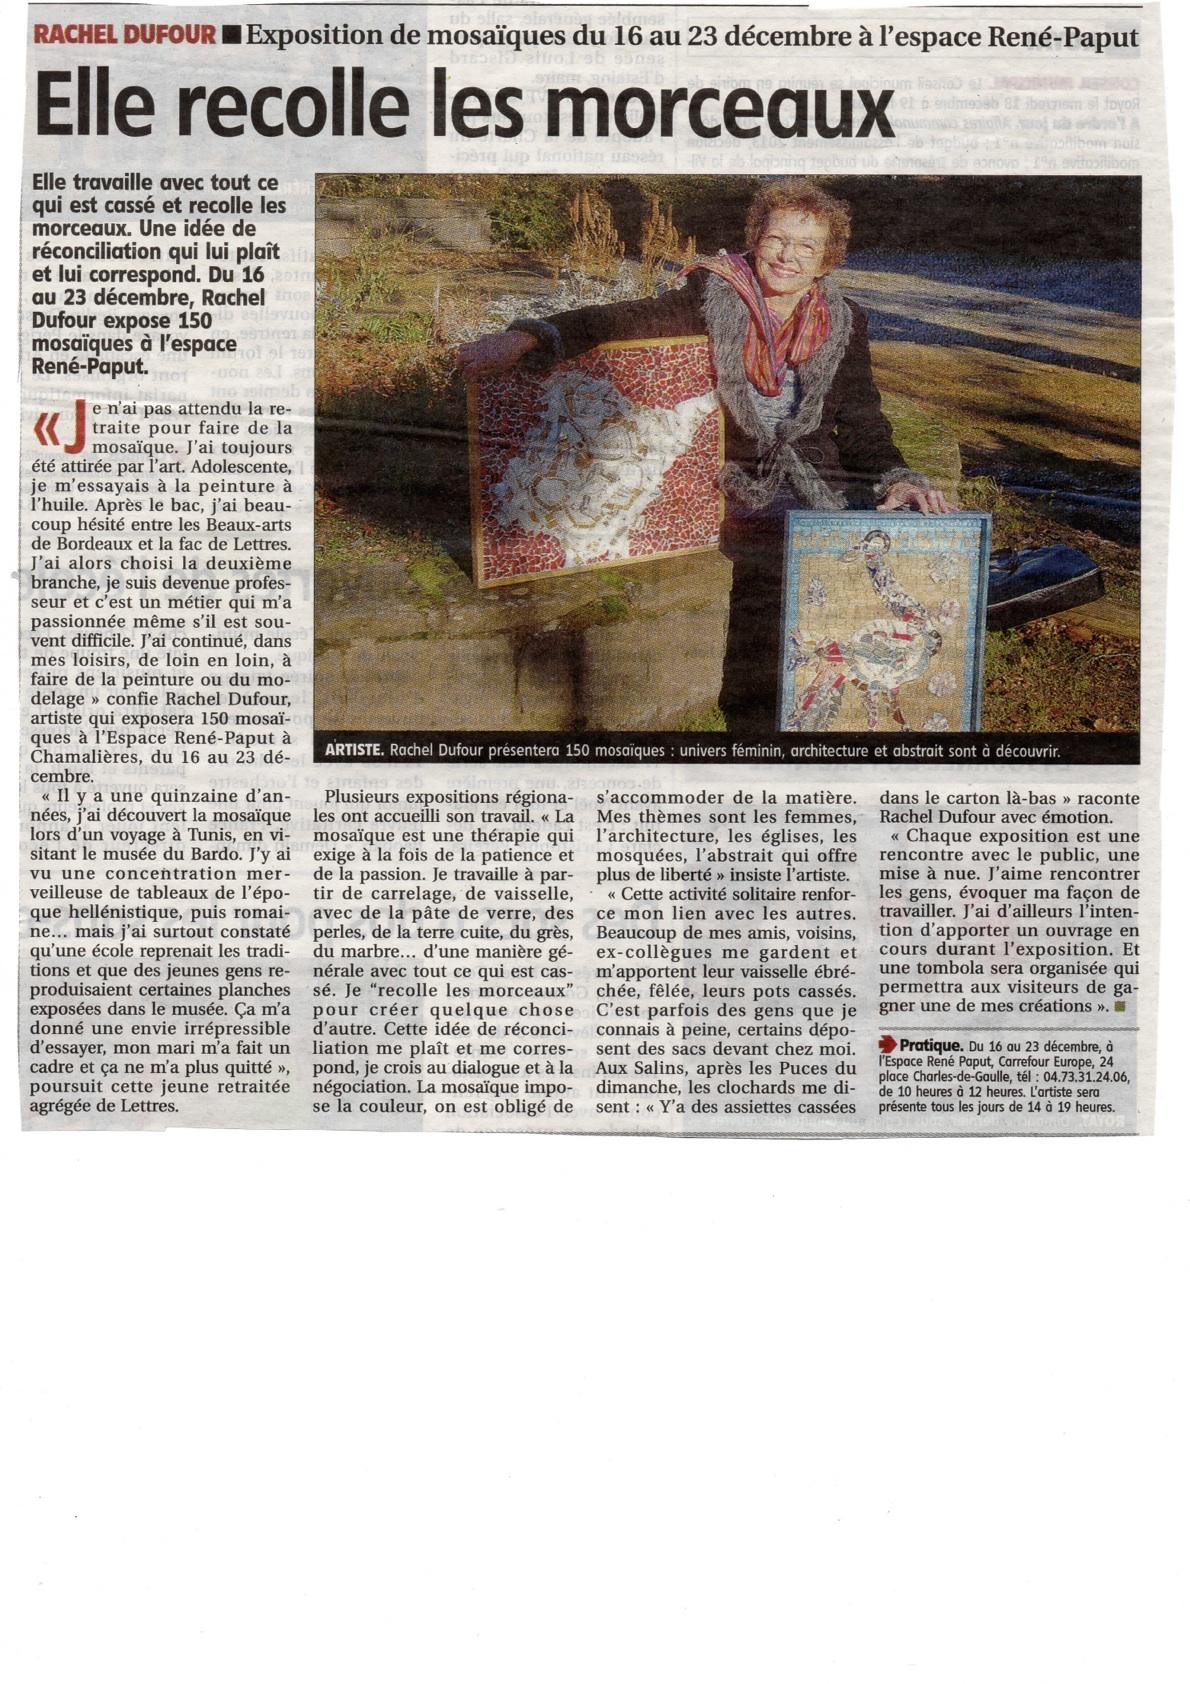 article presse 14.12